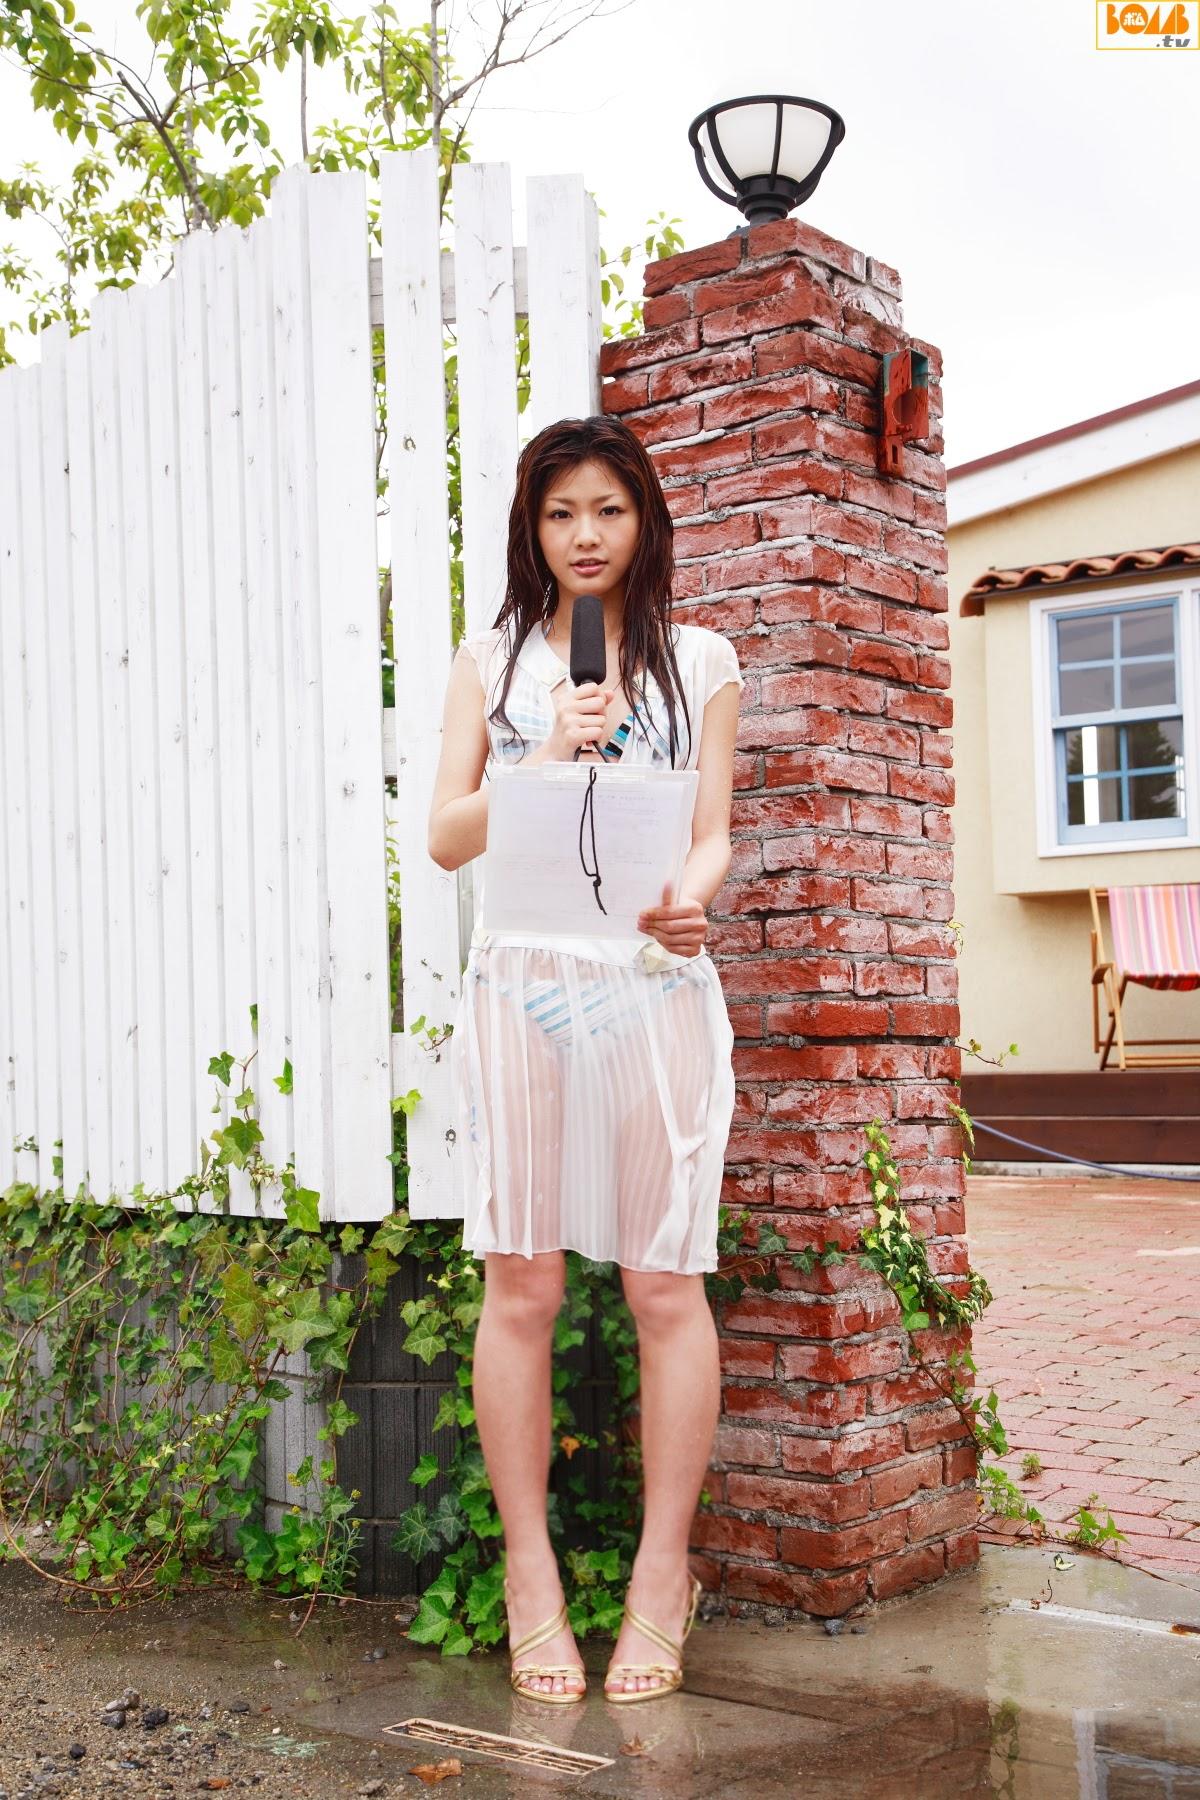 New era gravure harbor contact wet transparent sheer weather sister Rika Sato013